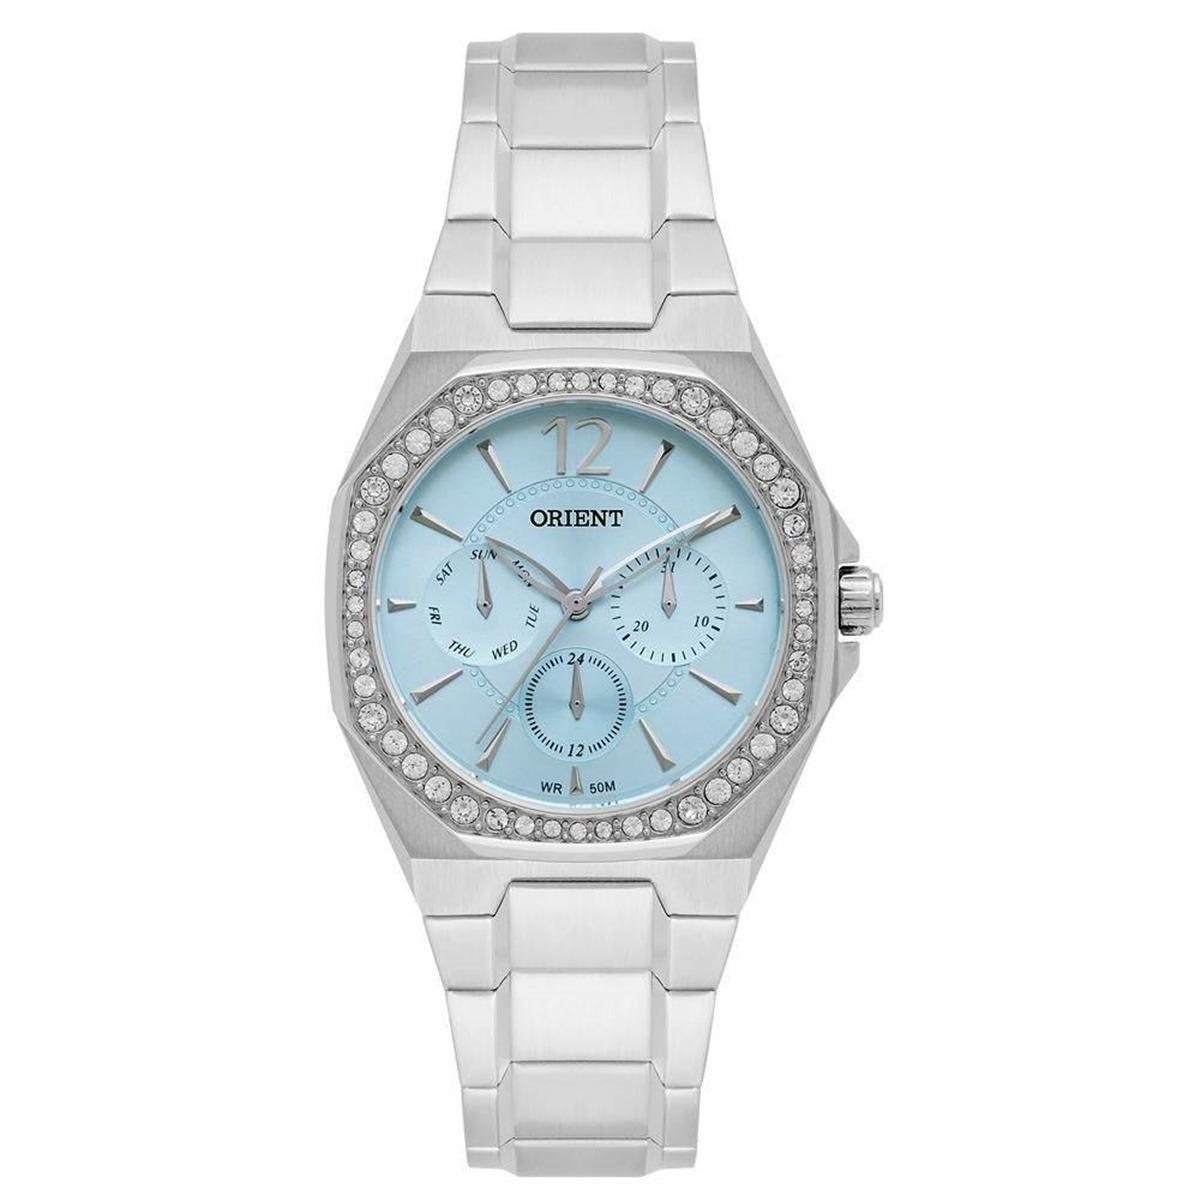 6c5186fdd77 relógio orient feminino prata 50 metros quadrado fbssm031. Carregando zoom.